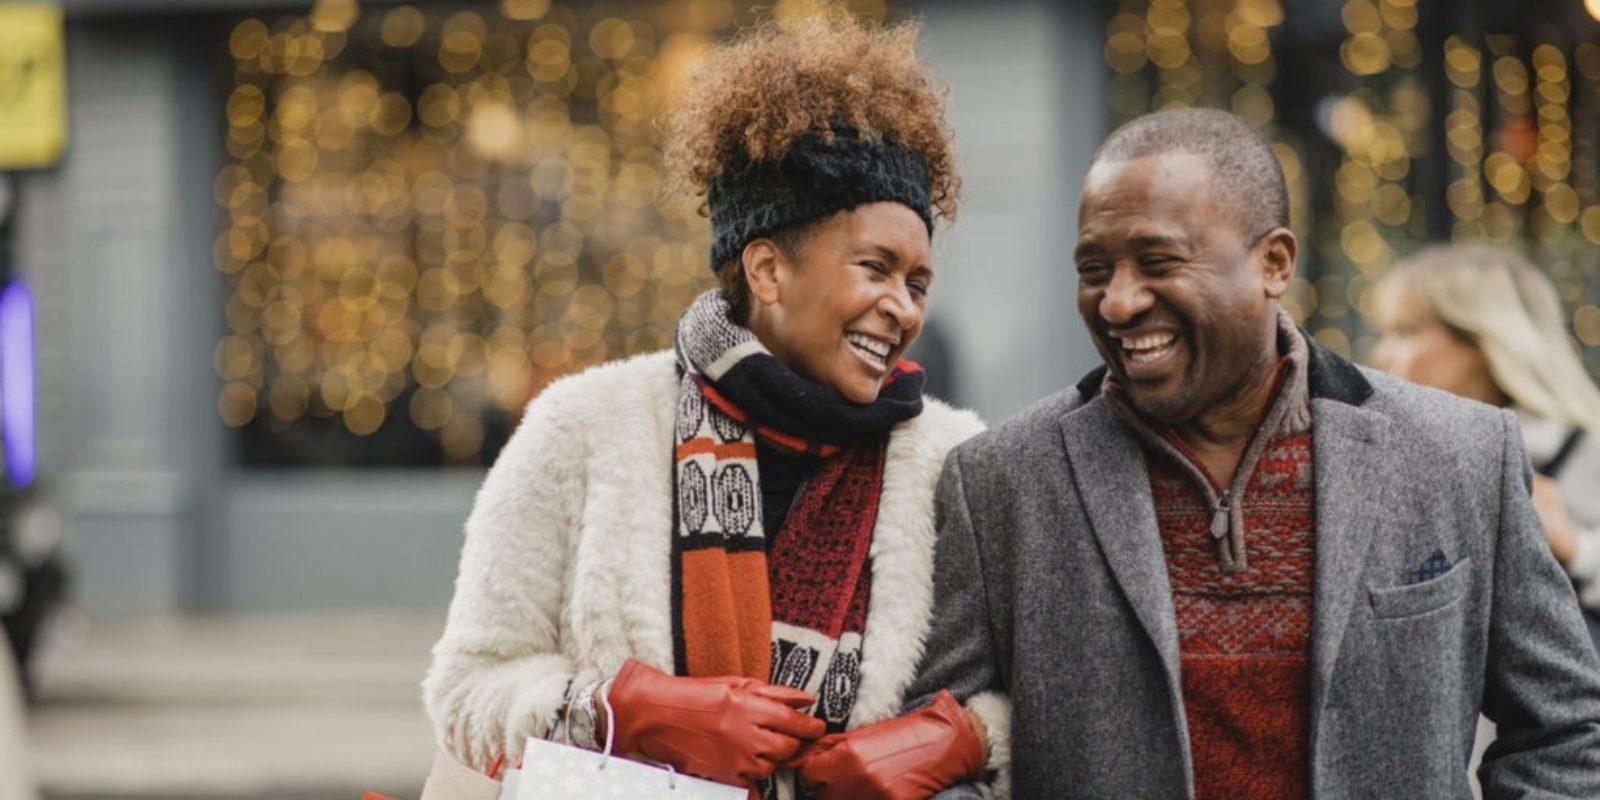 couple out shopping with no arthritis